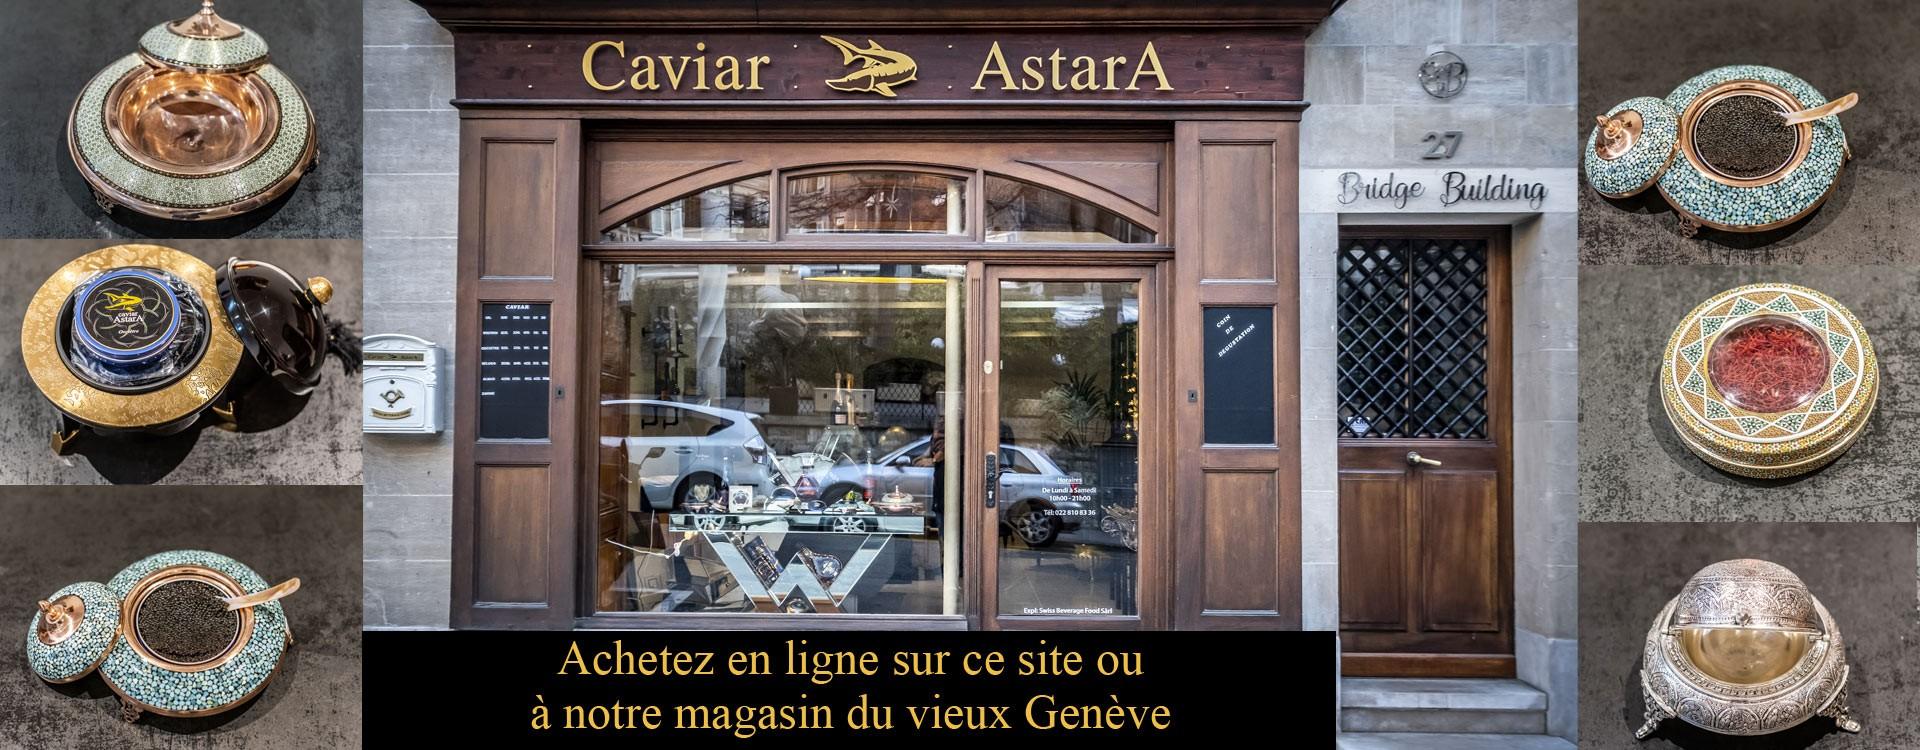 Caviar accessoires